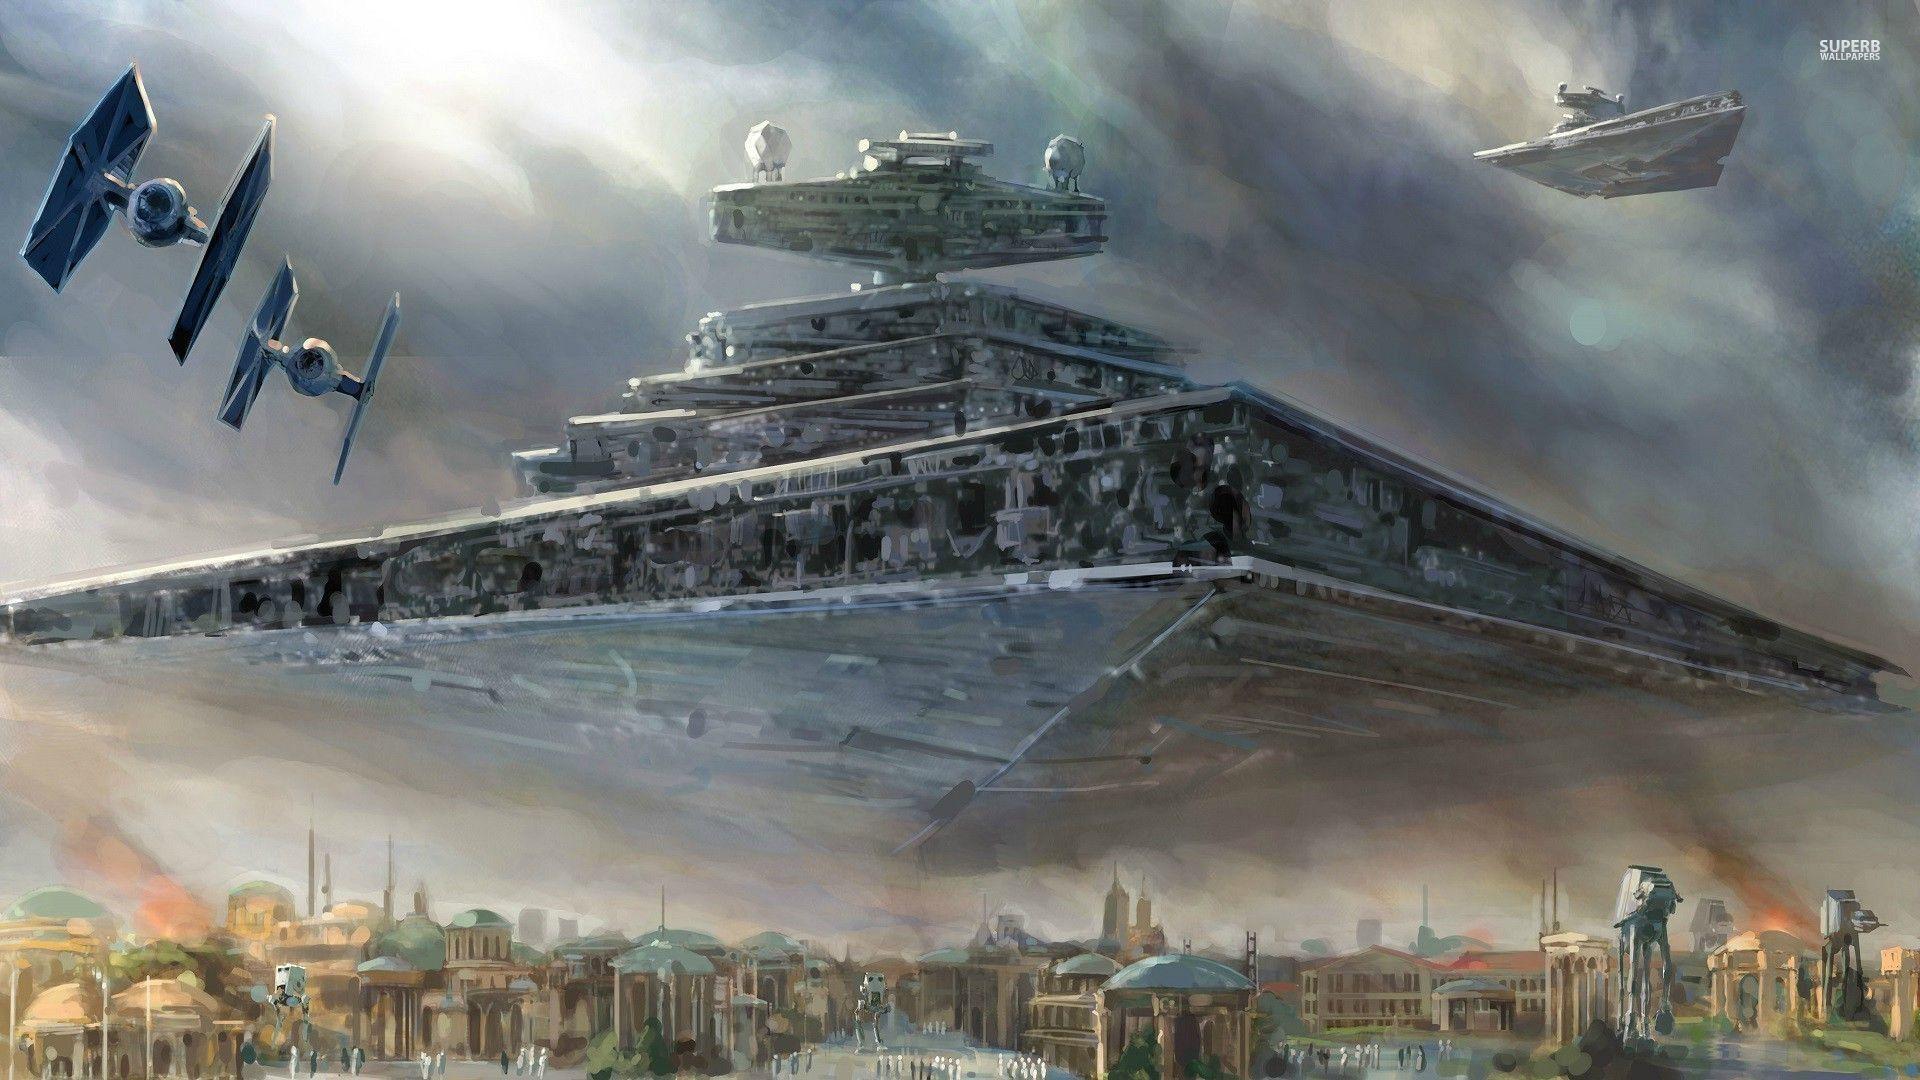 1920x1080 Star Wars Empire Logo Wallpaper Pictures To Pin On Pinterest Star Wars Spaceships Star Wars Pictures Star Wars Artwork